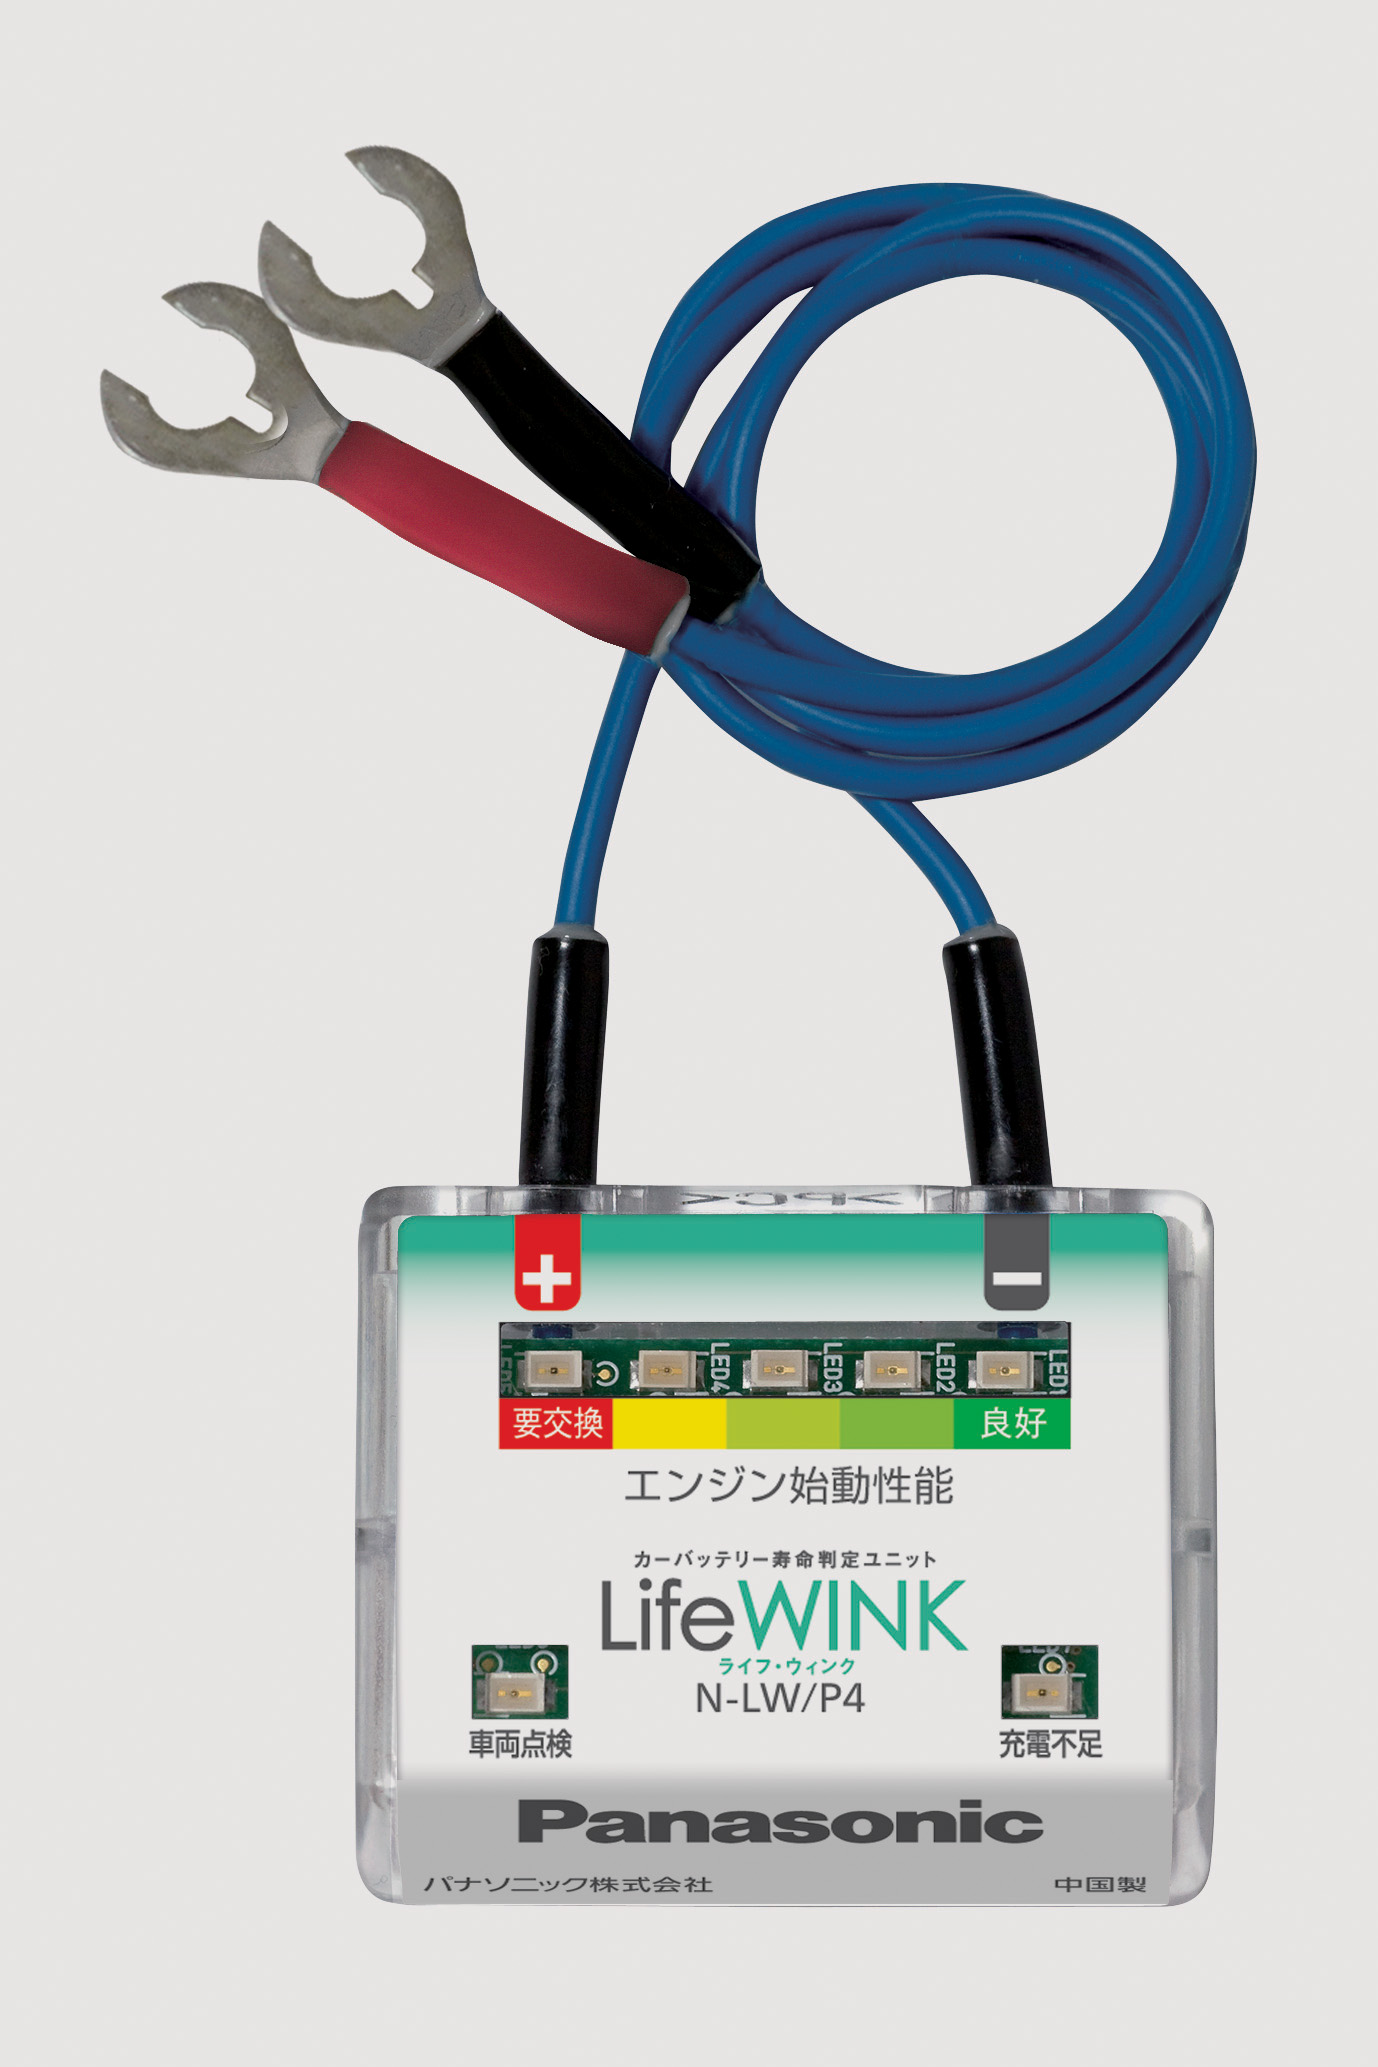 「Life WINK」本体